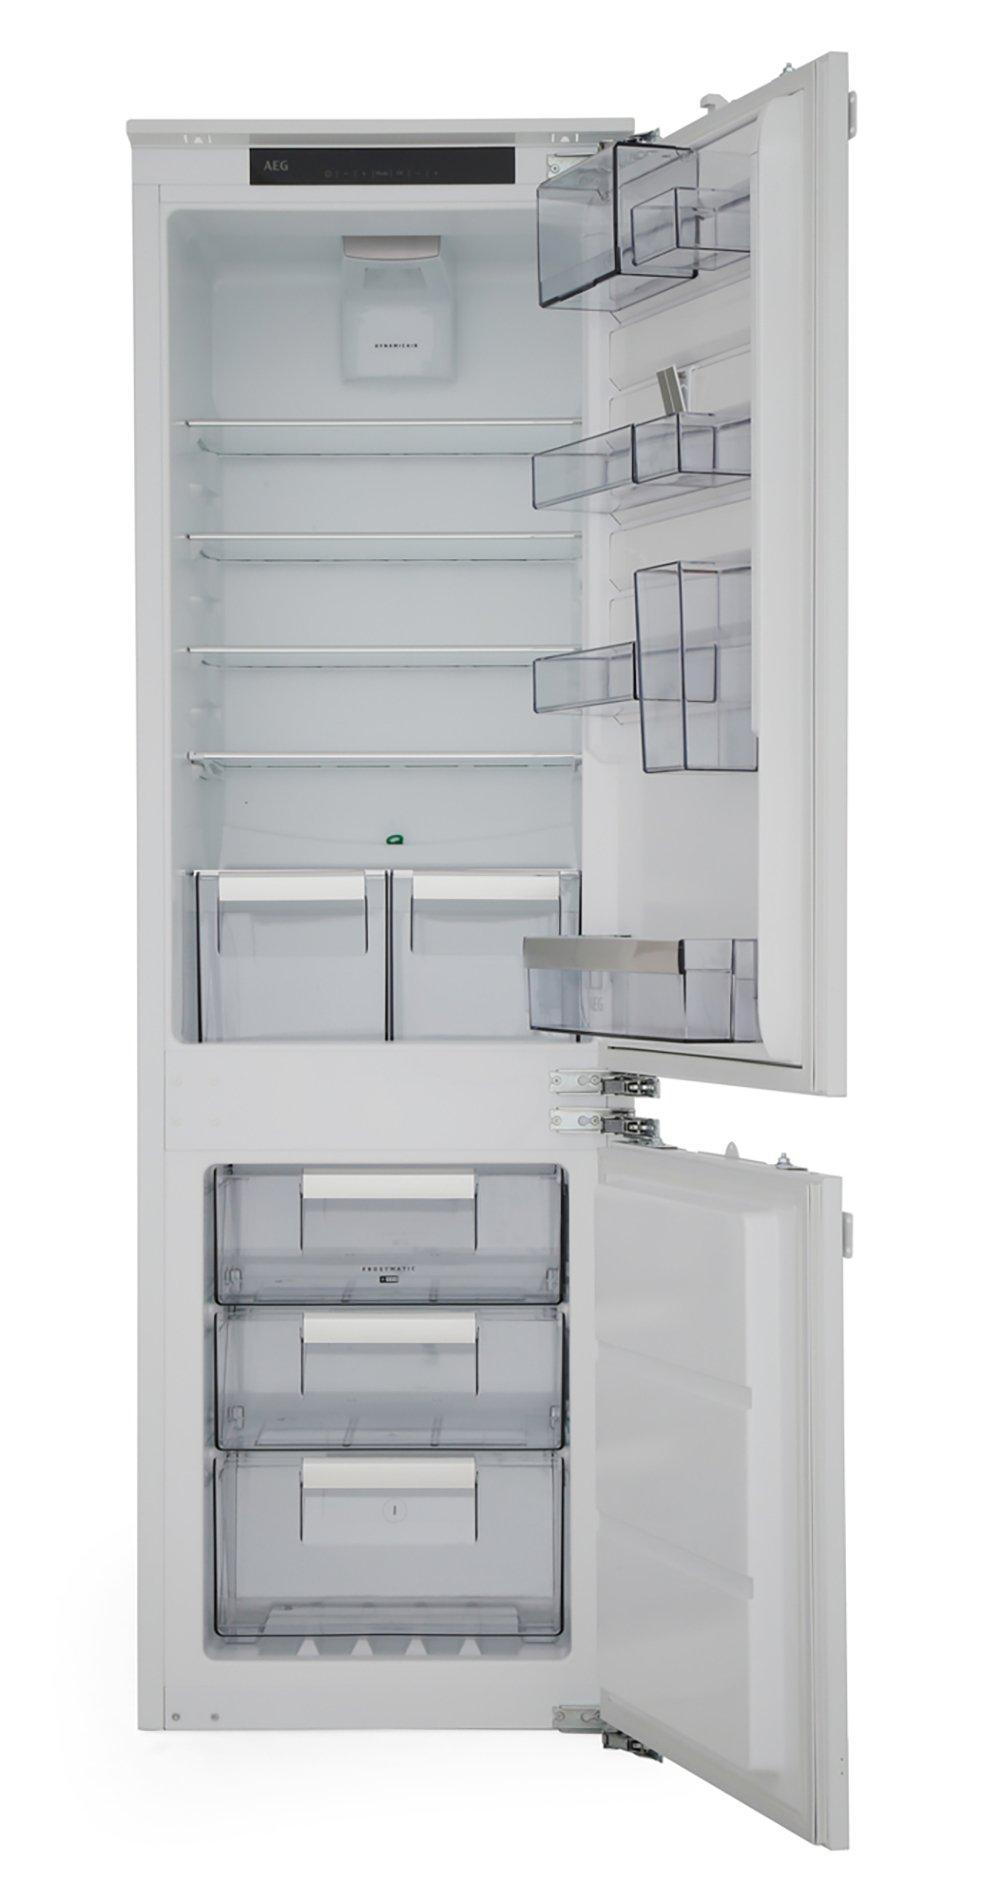 AEG SCE8186VTC Frost Free Integrated Fridge Freezer